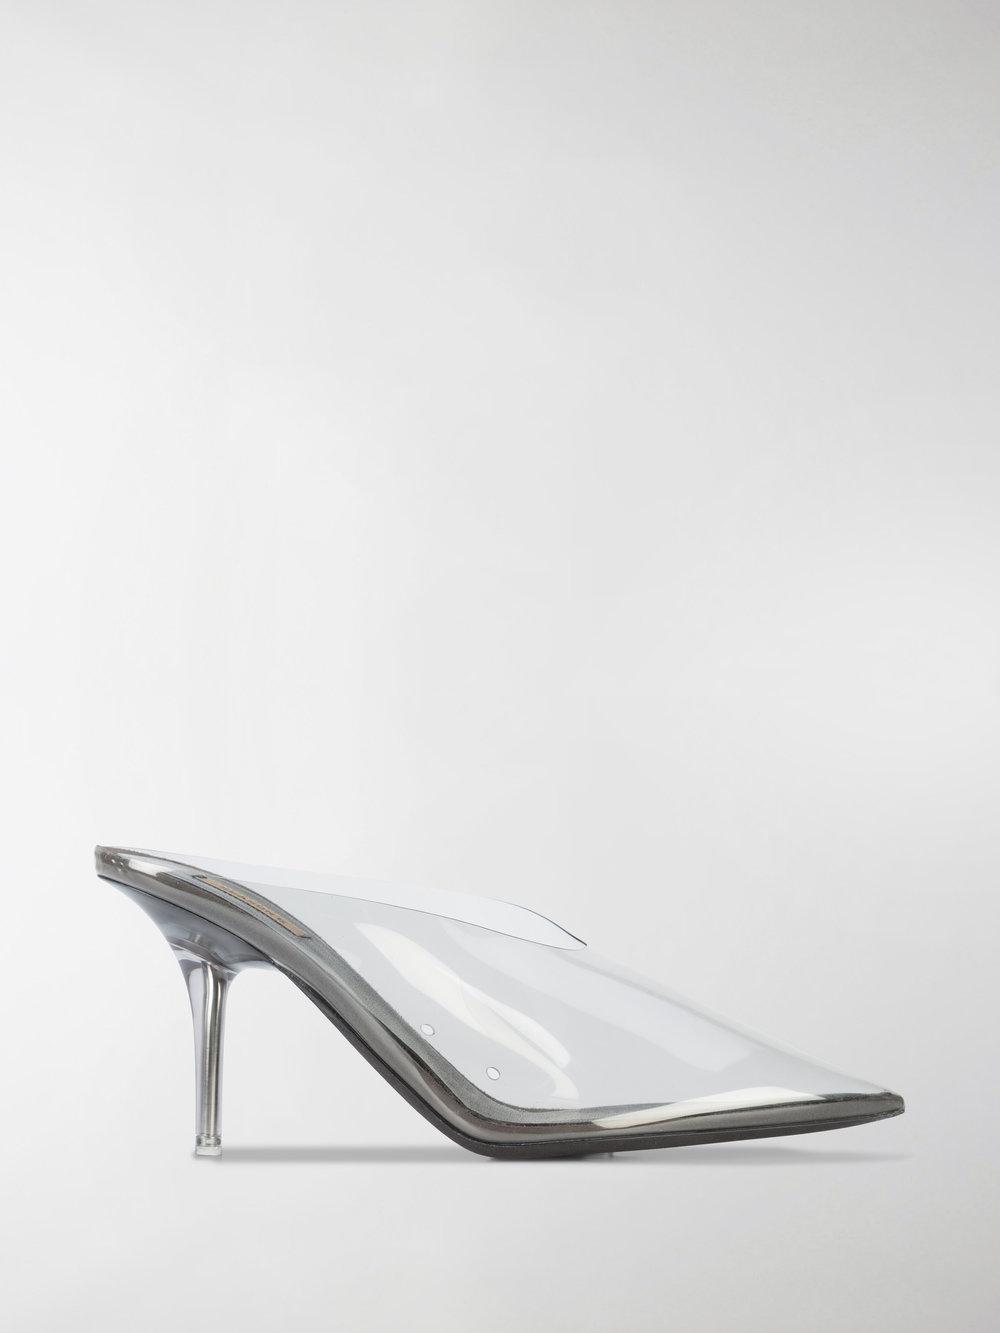 ca308a43543a0 Lyst - Yeezy Season 6 Pvc Mules in White